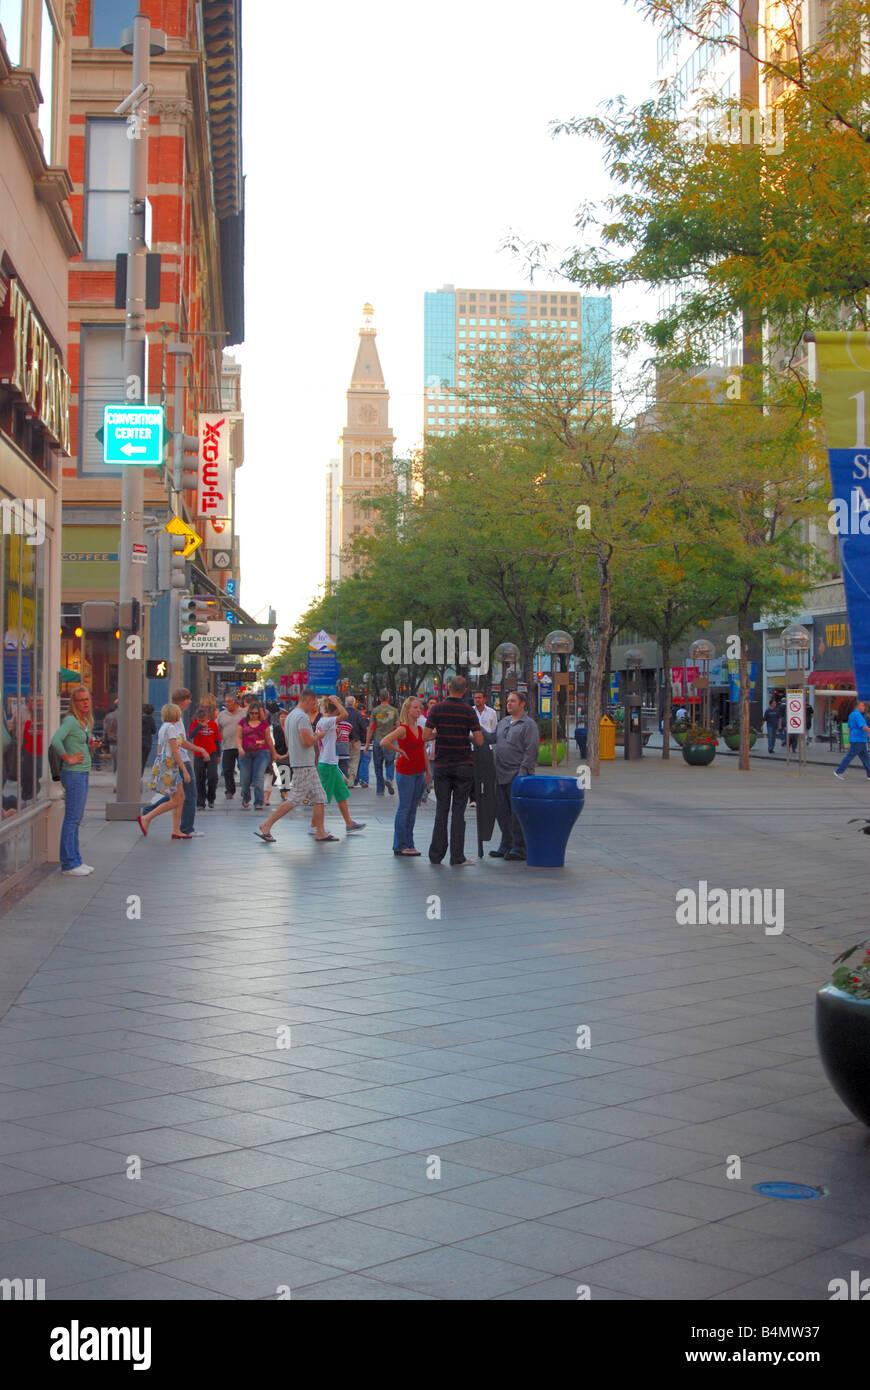 Busy street scene in a major american city - Stock Image